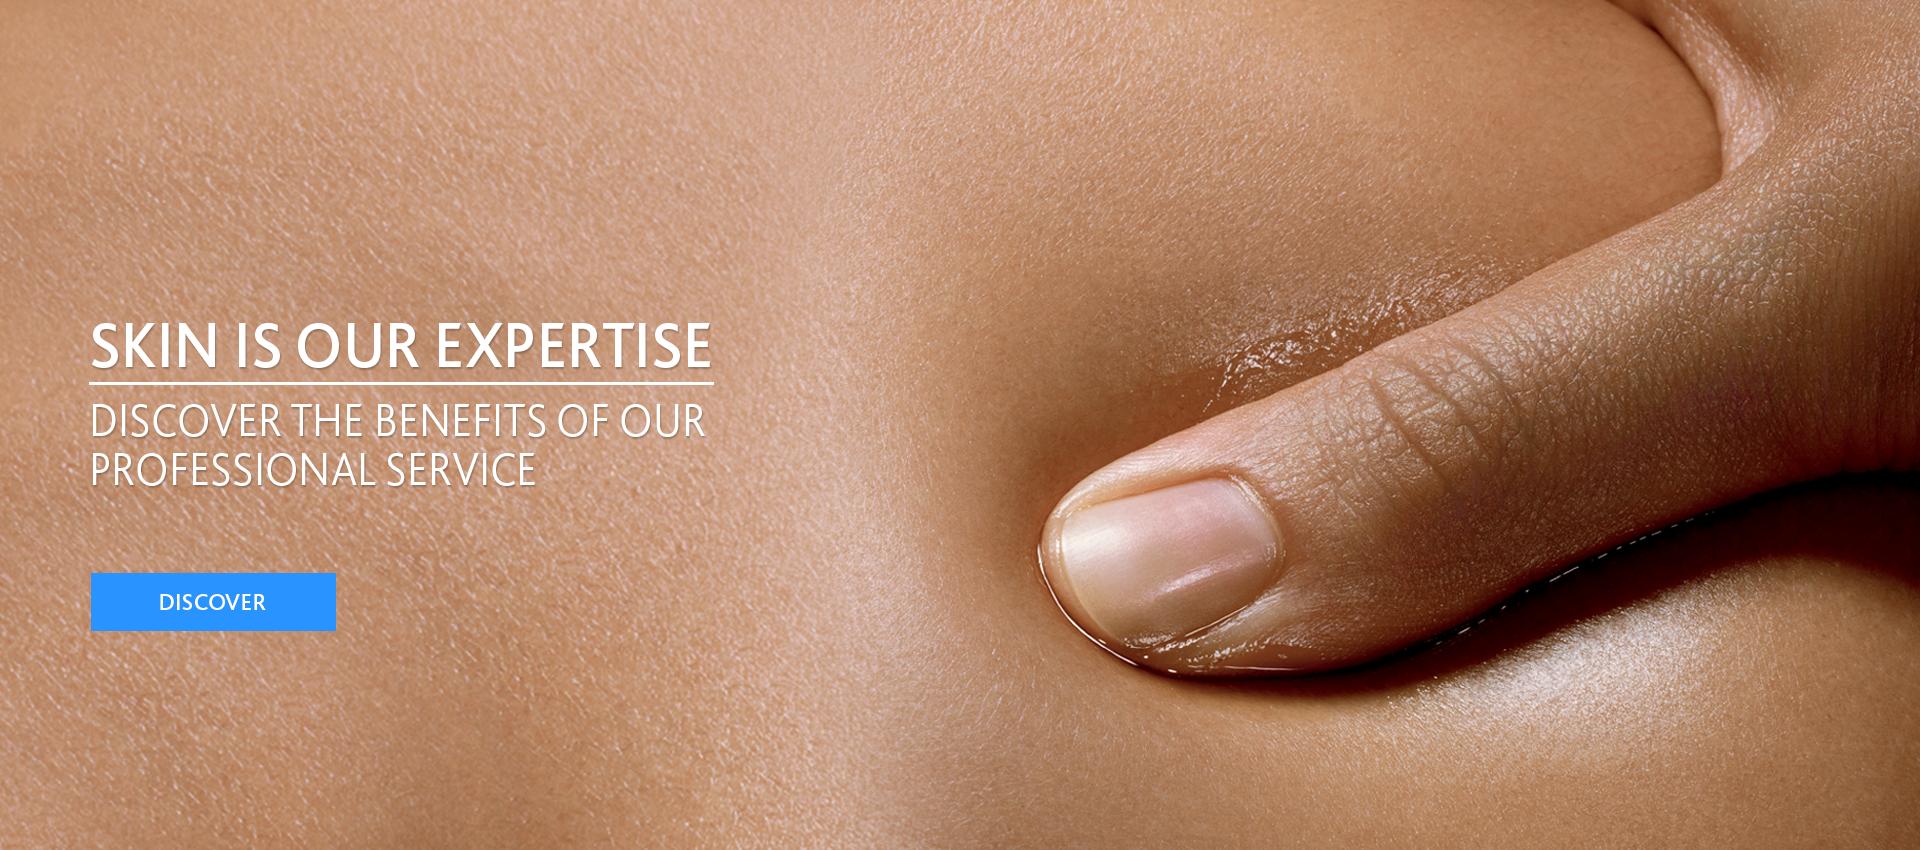 205d79c8c4 Institut Esthederm® - Skin is our profession